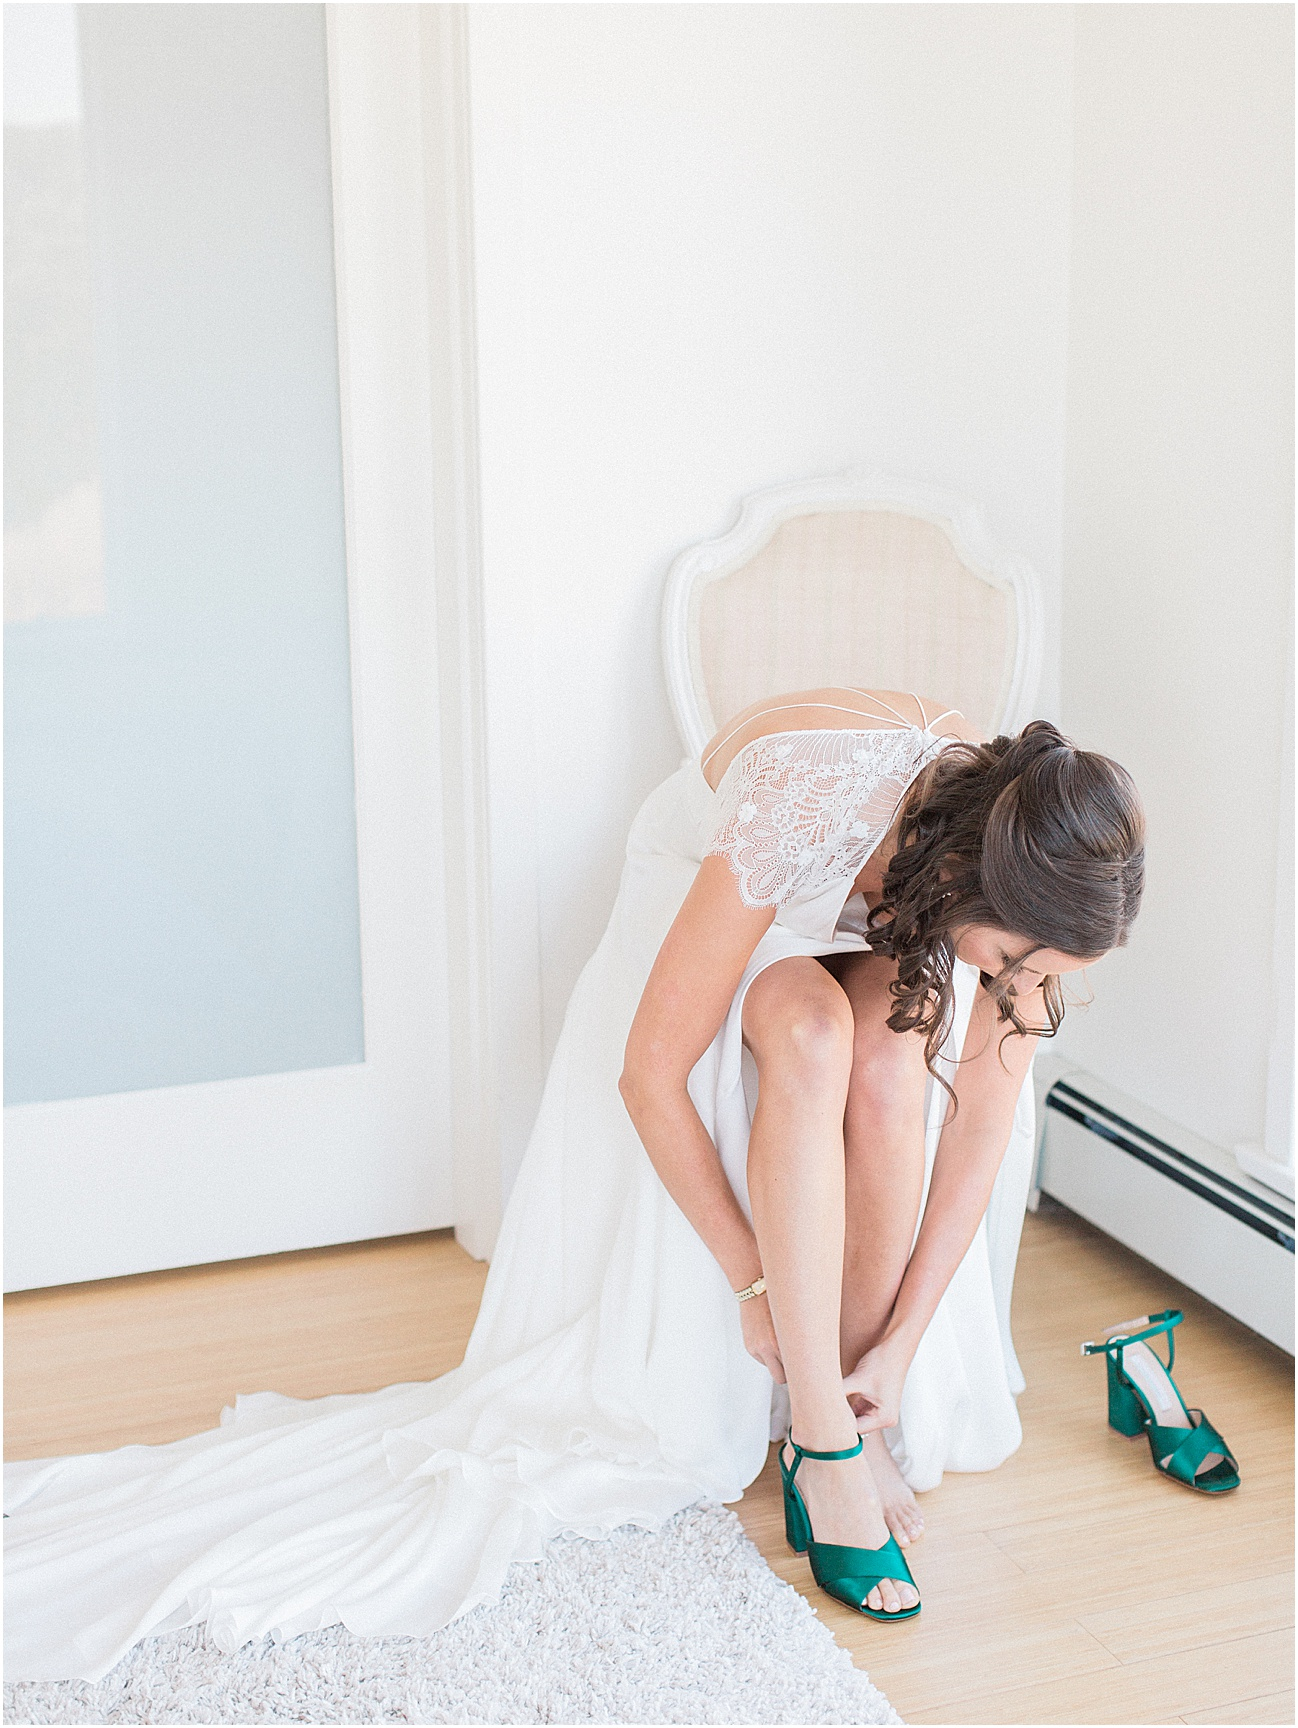 jenna_mike_willowdale_estate_topsfield_neutral_whites_greens_fall_cape_cod_boston_wedding_photographer_meredith_jane_photography_photo_1424.jpg